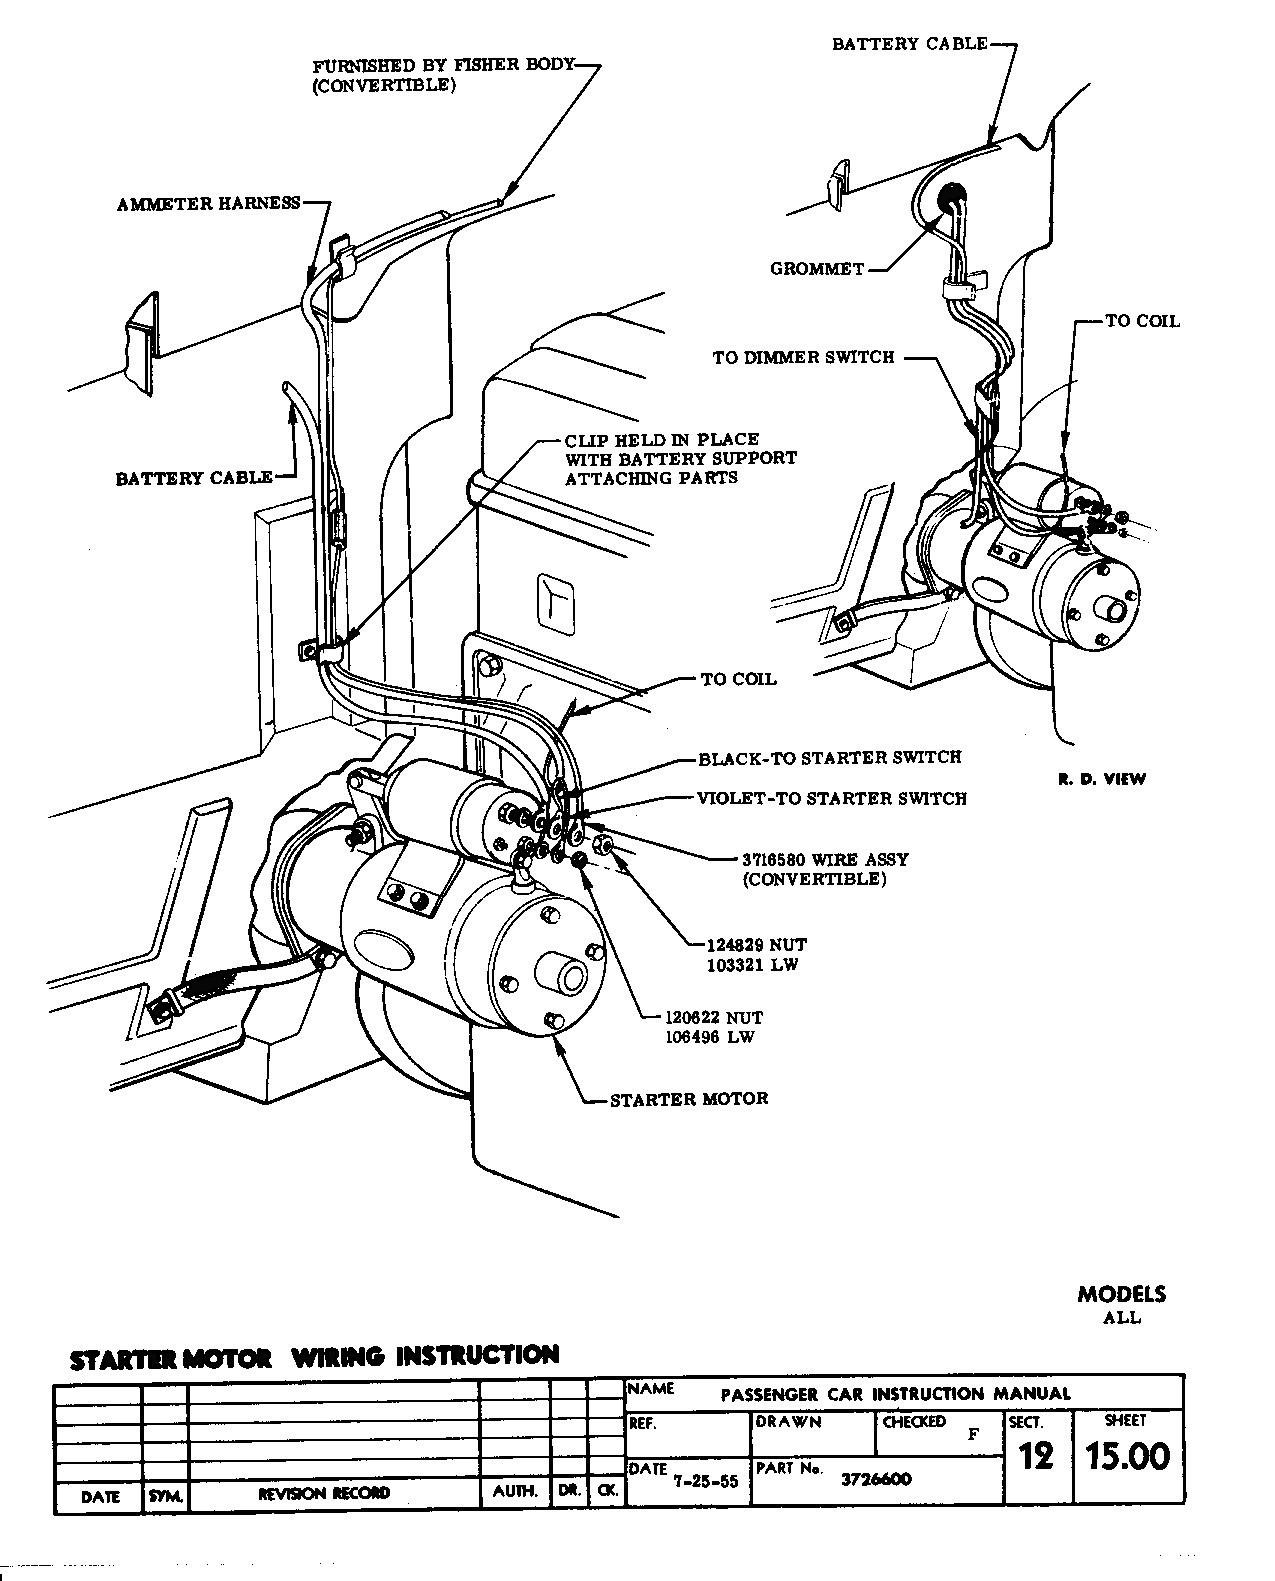 Diagram Mazda Tribute Wiring Diagram Full Version Hd Quality Wiring Diagram Wiringmethodl Nuovarmata It